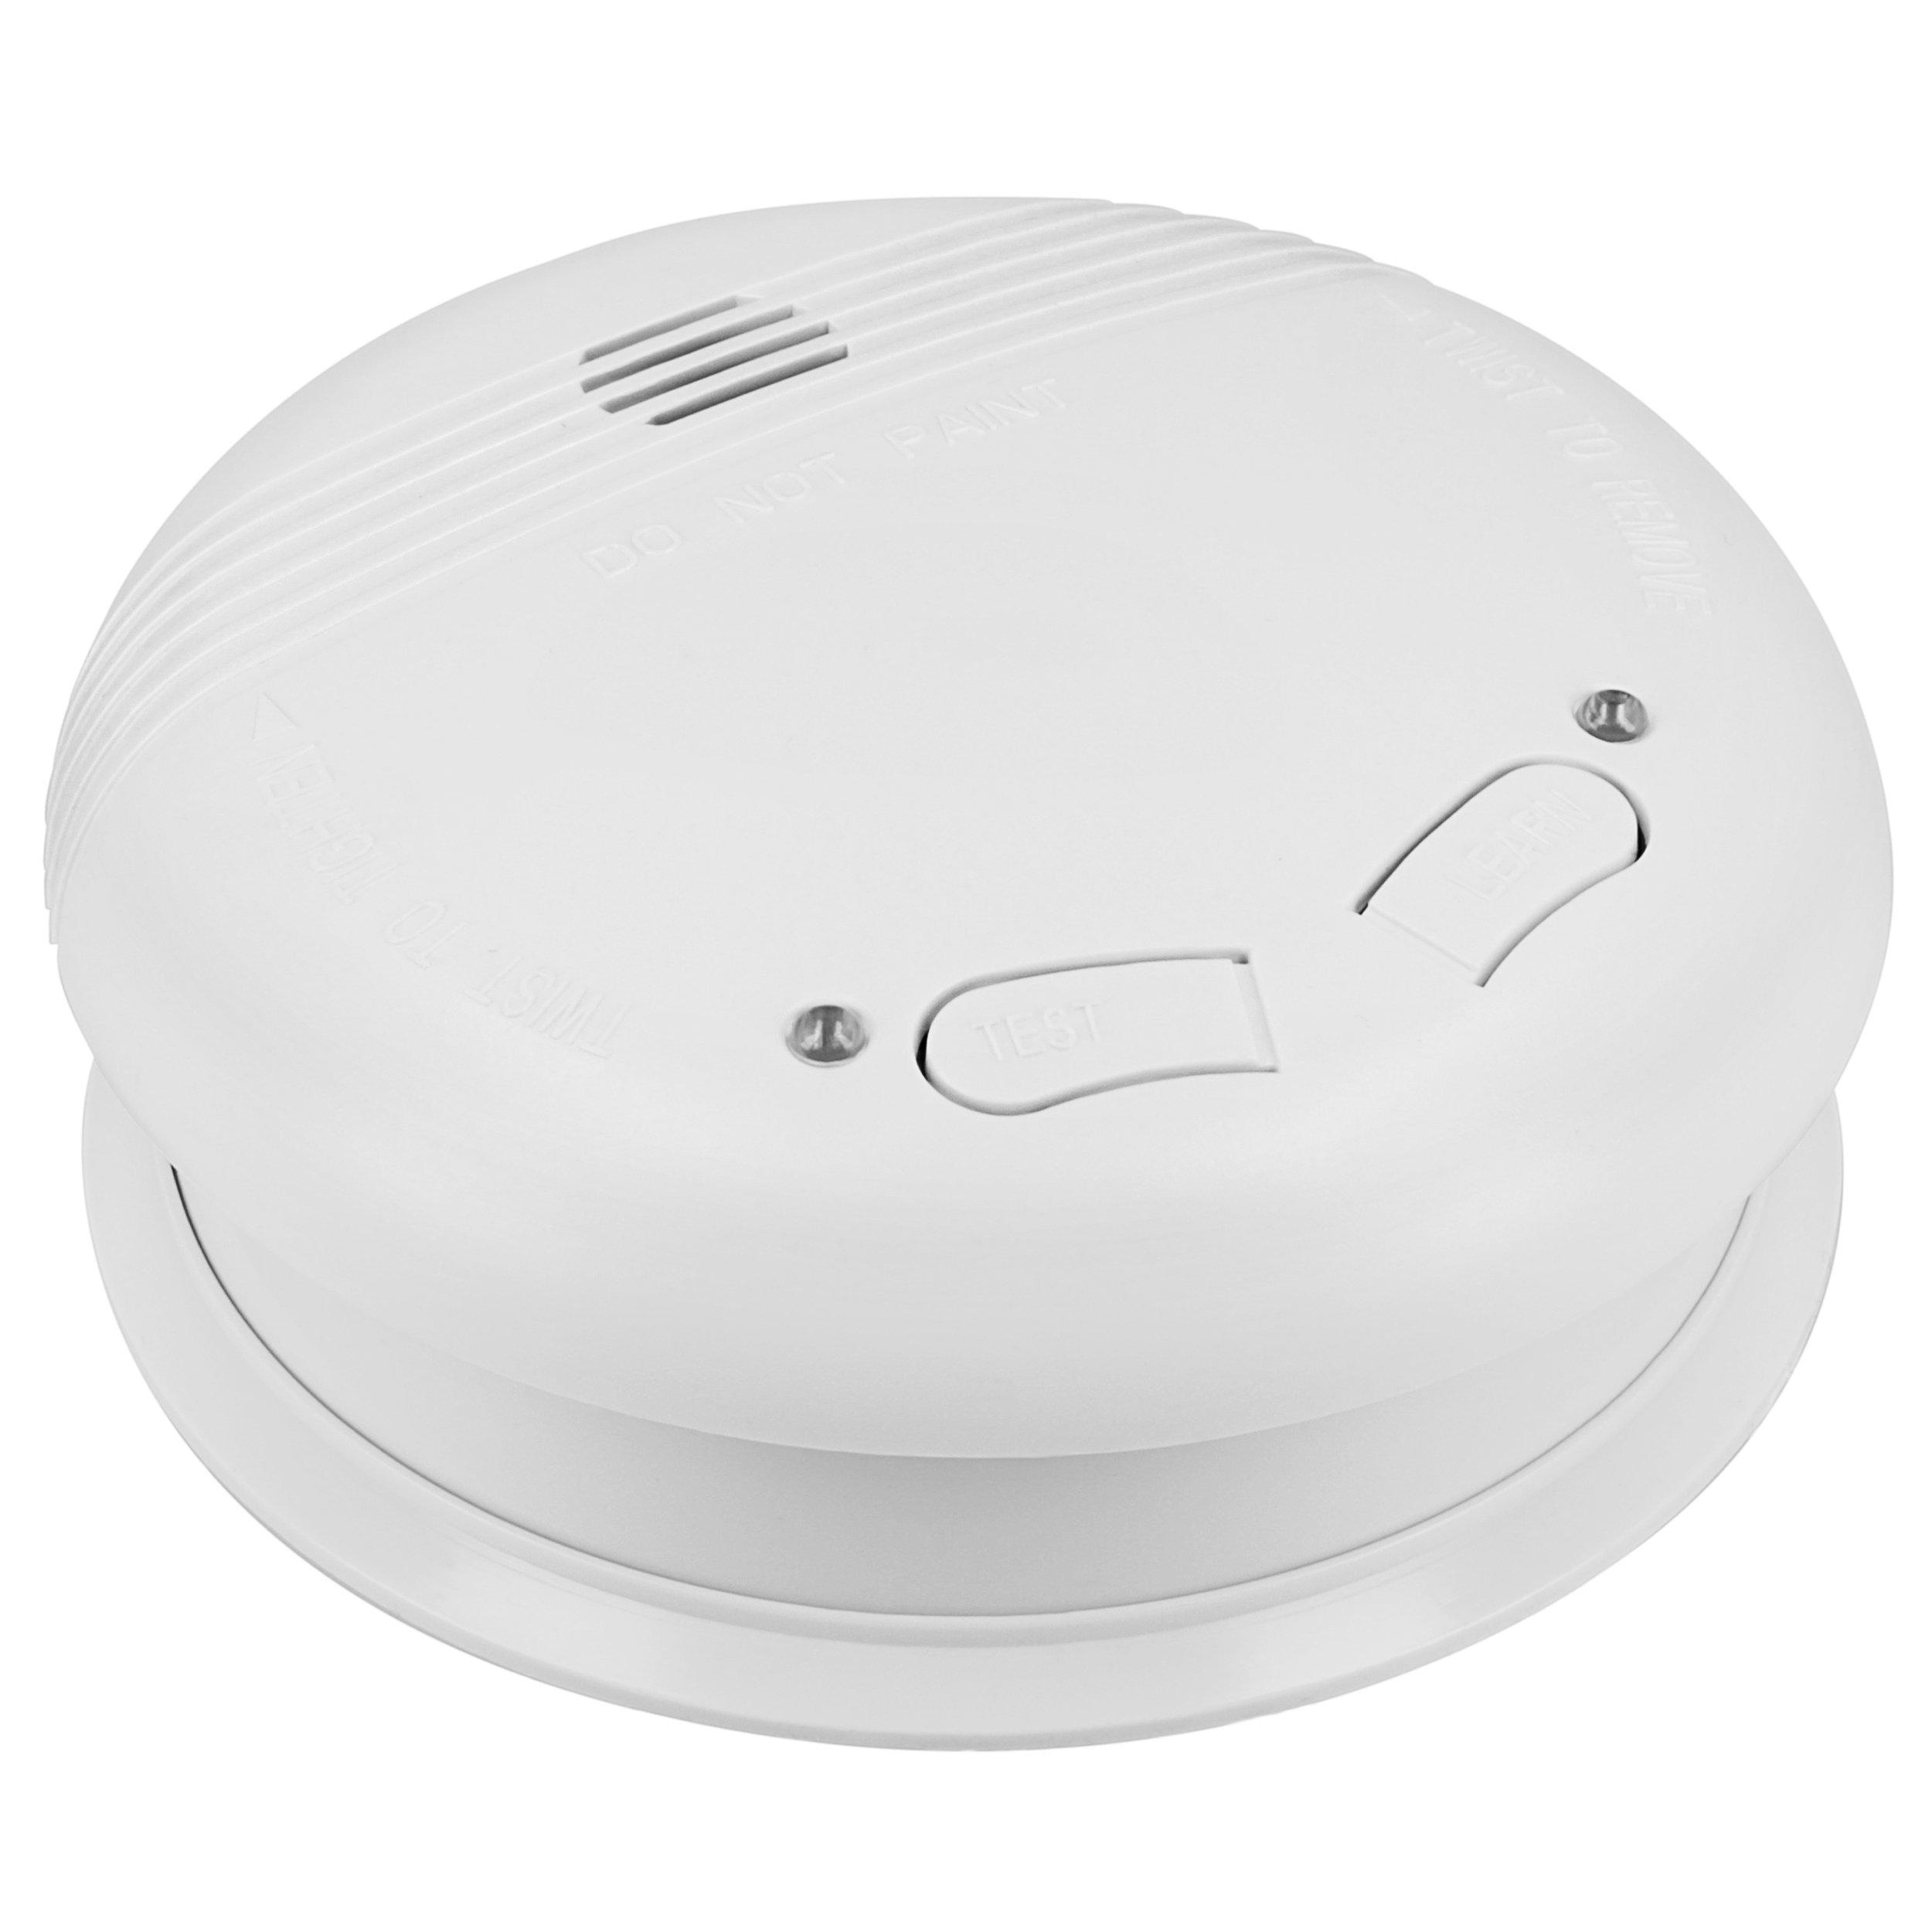 RMF150 Wireless Smoke Detector